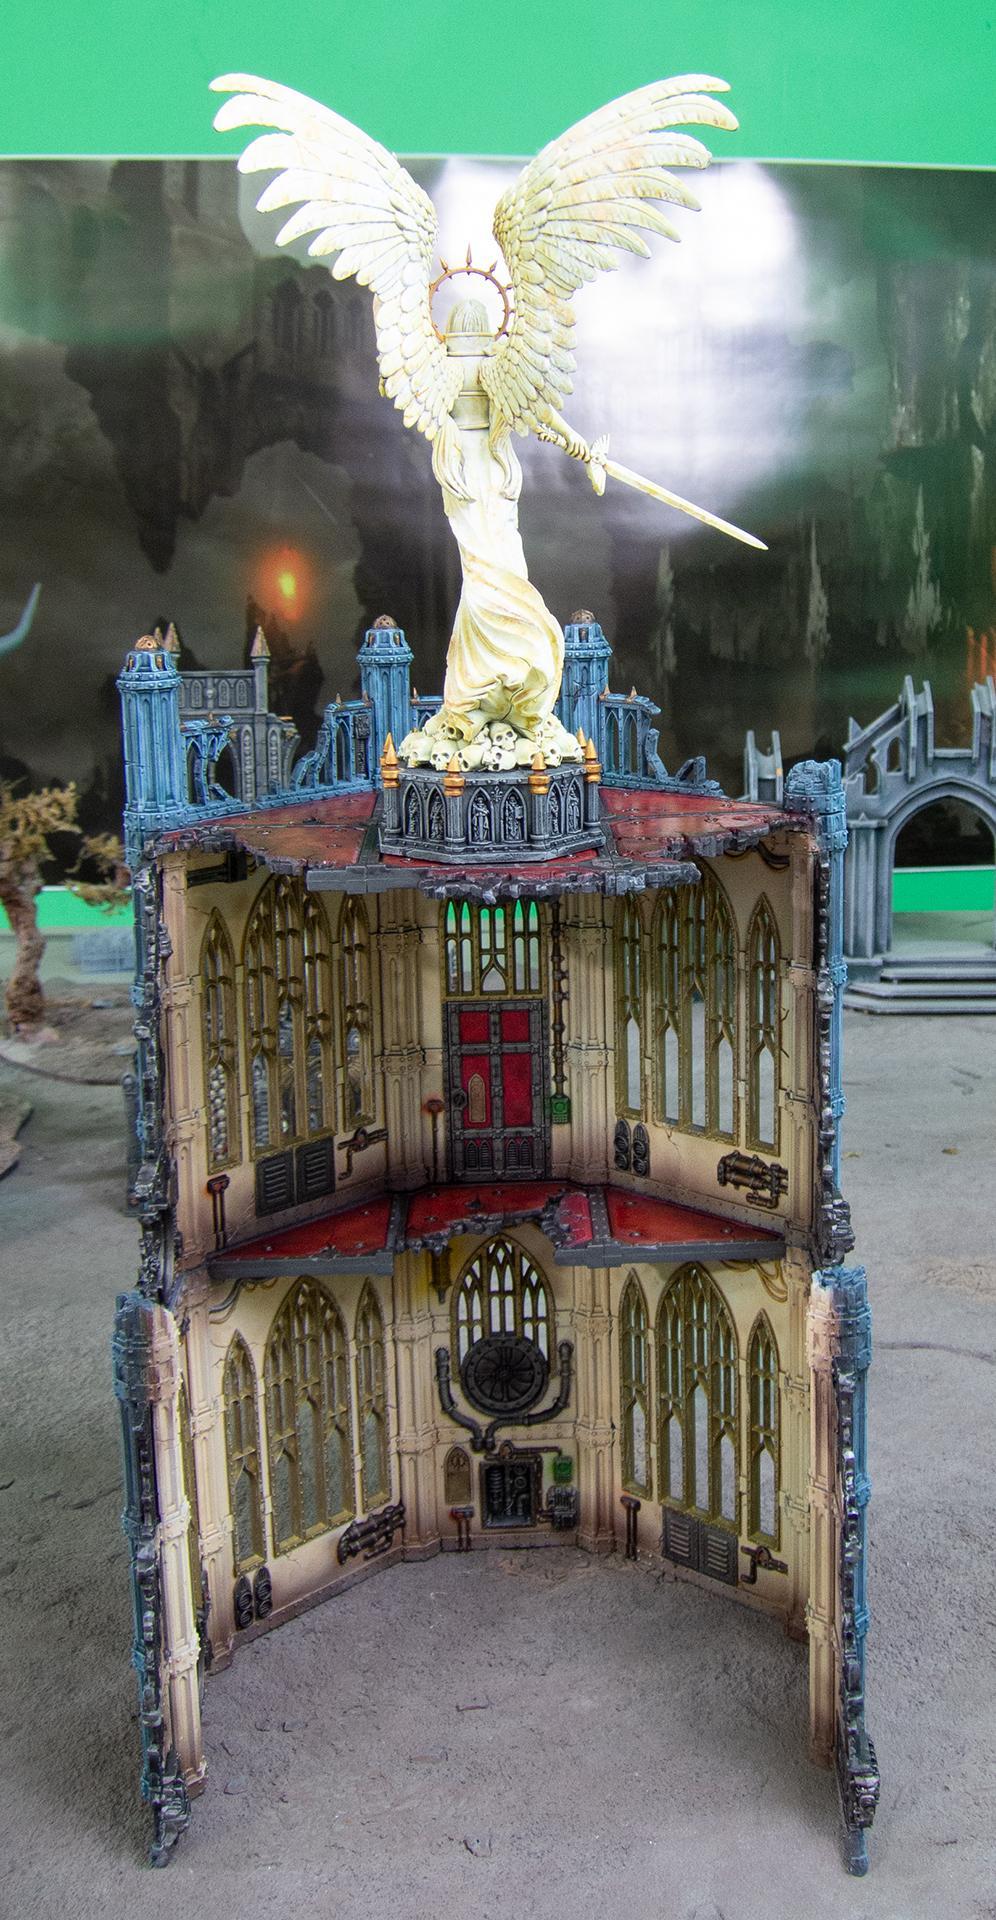 Airbrush, Battle Sanctum, Buildings, Celestine, Marble, Sanctum, Sisters Of Battle, Sororitas, Statue, Terrain